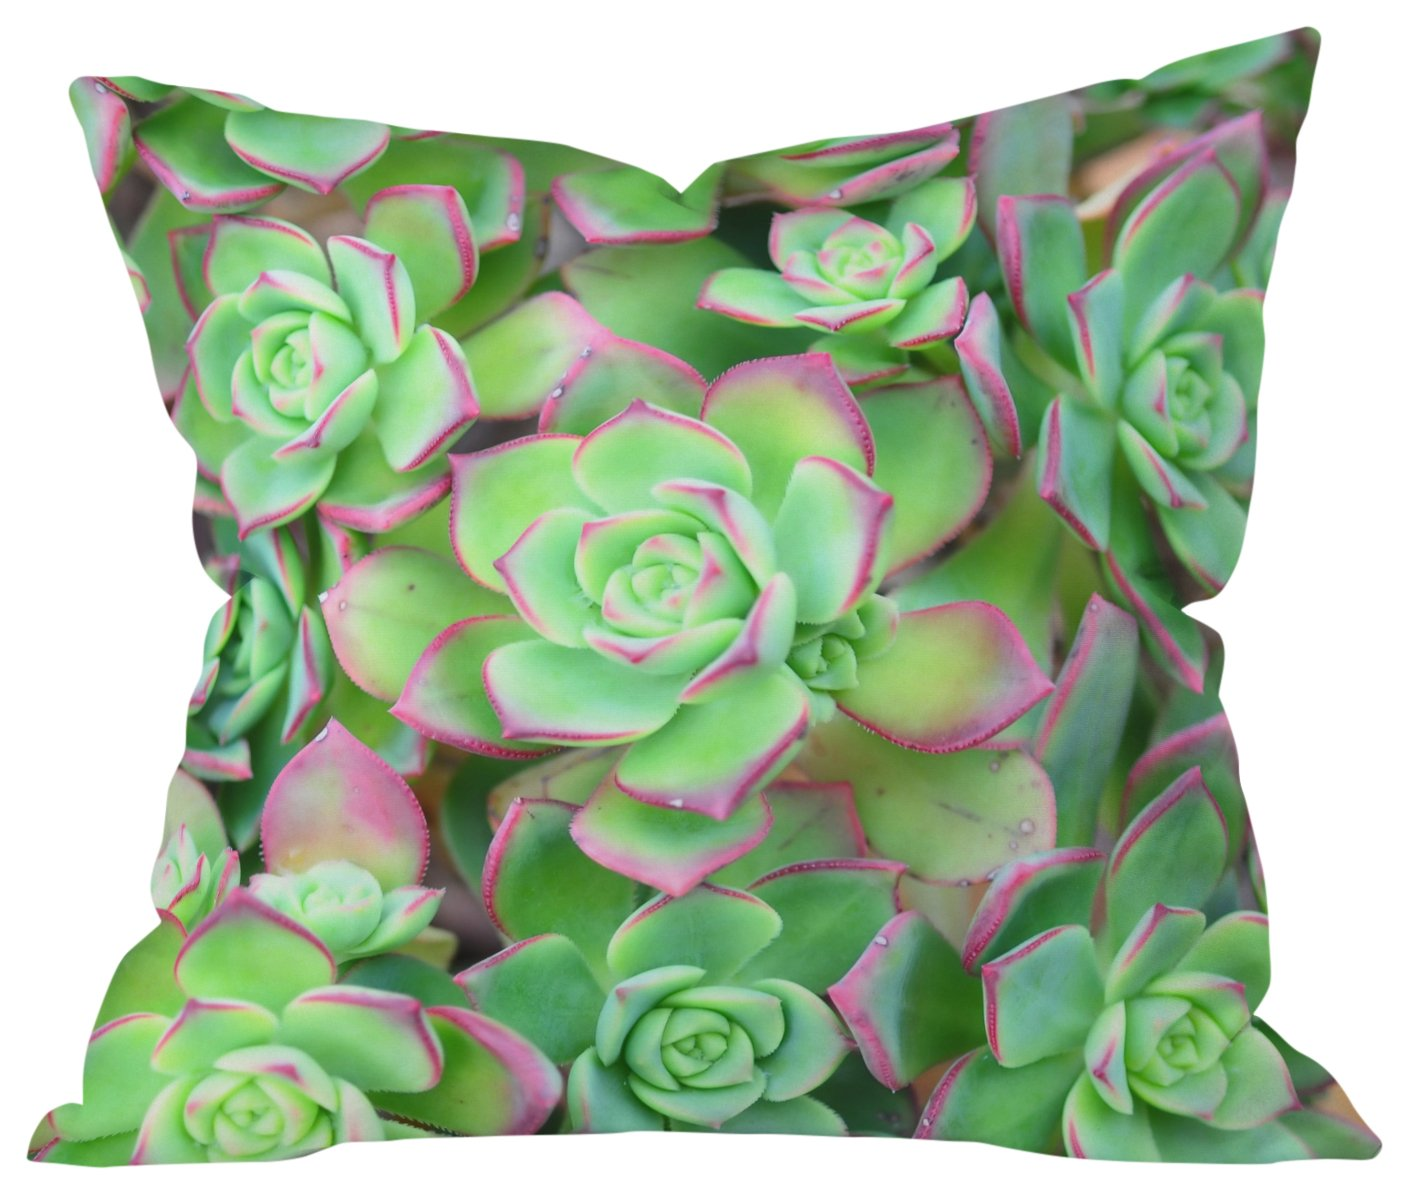 Deny Designs Lisa Argyropoulos Daffy Lattice Navy Outdoor Throw Pillow 20 x 20